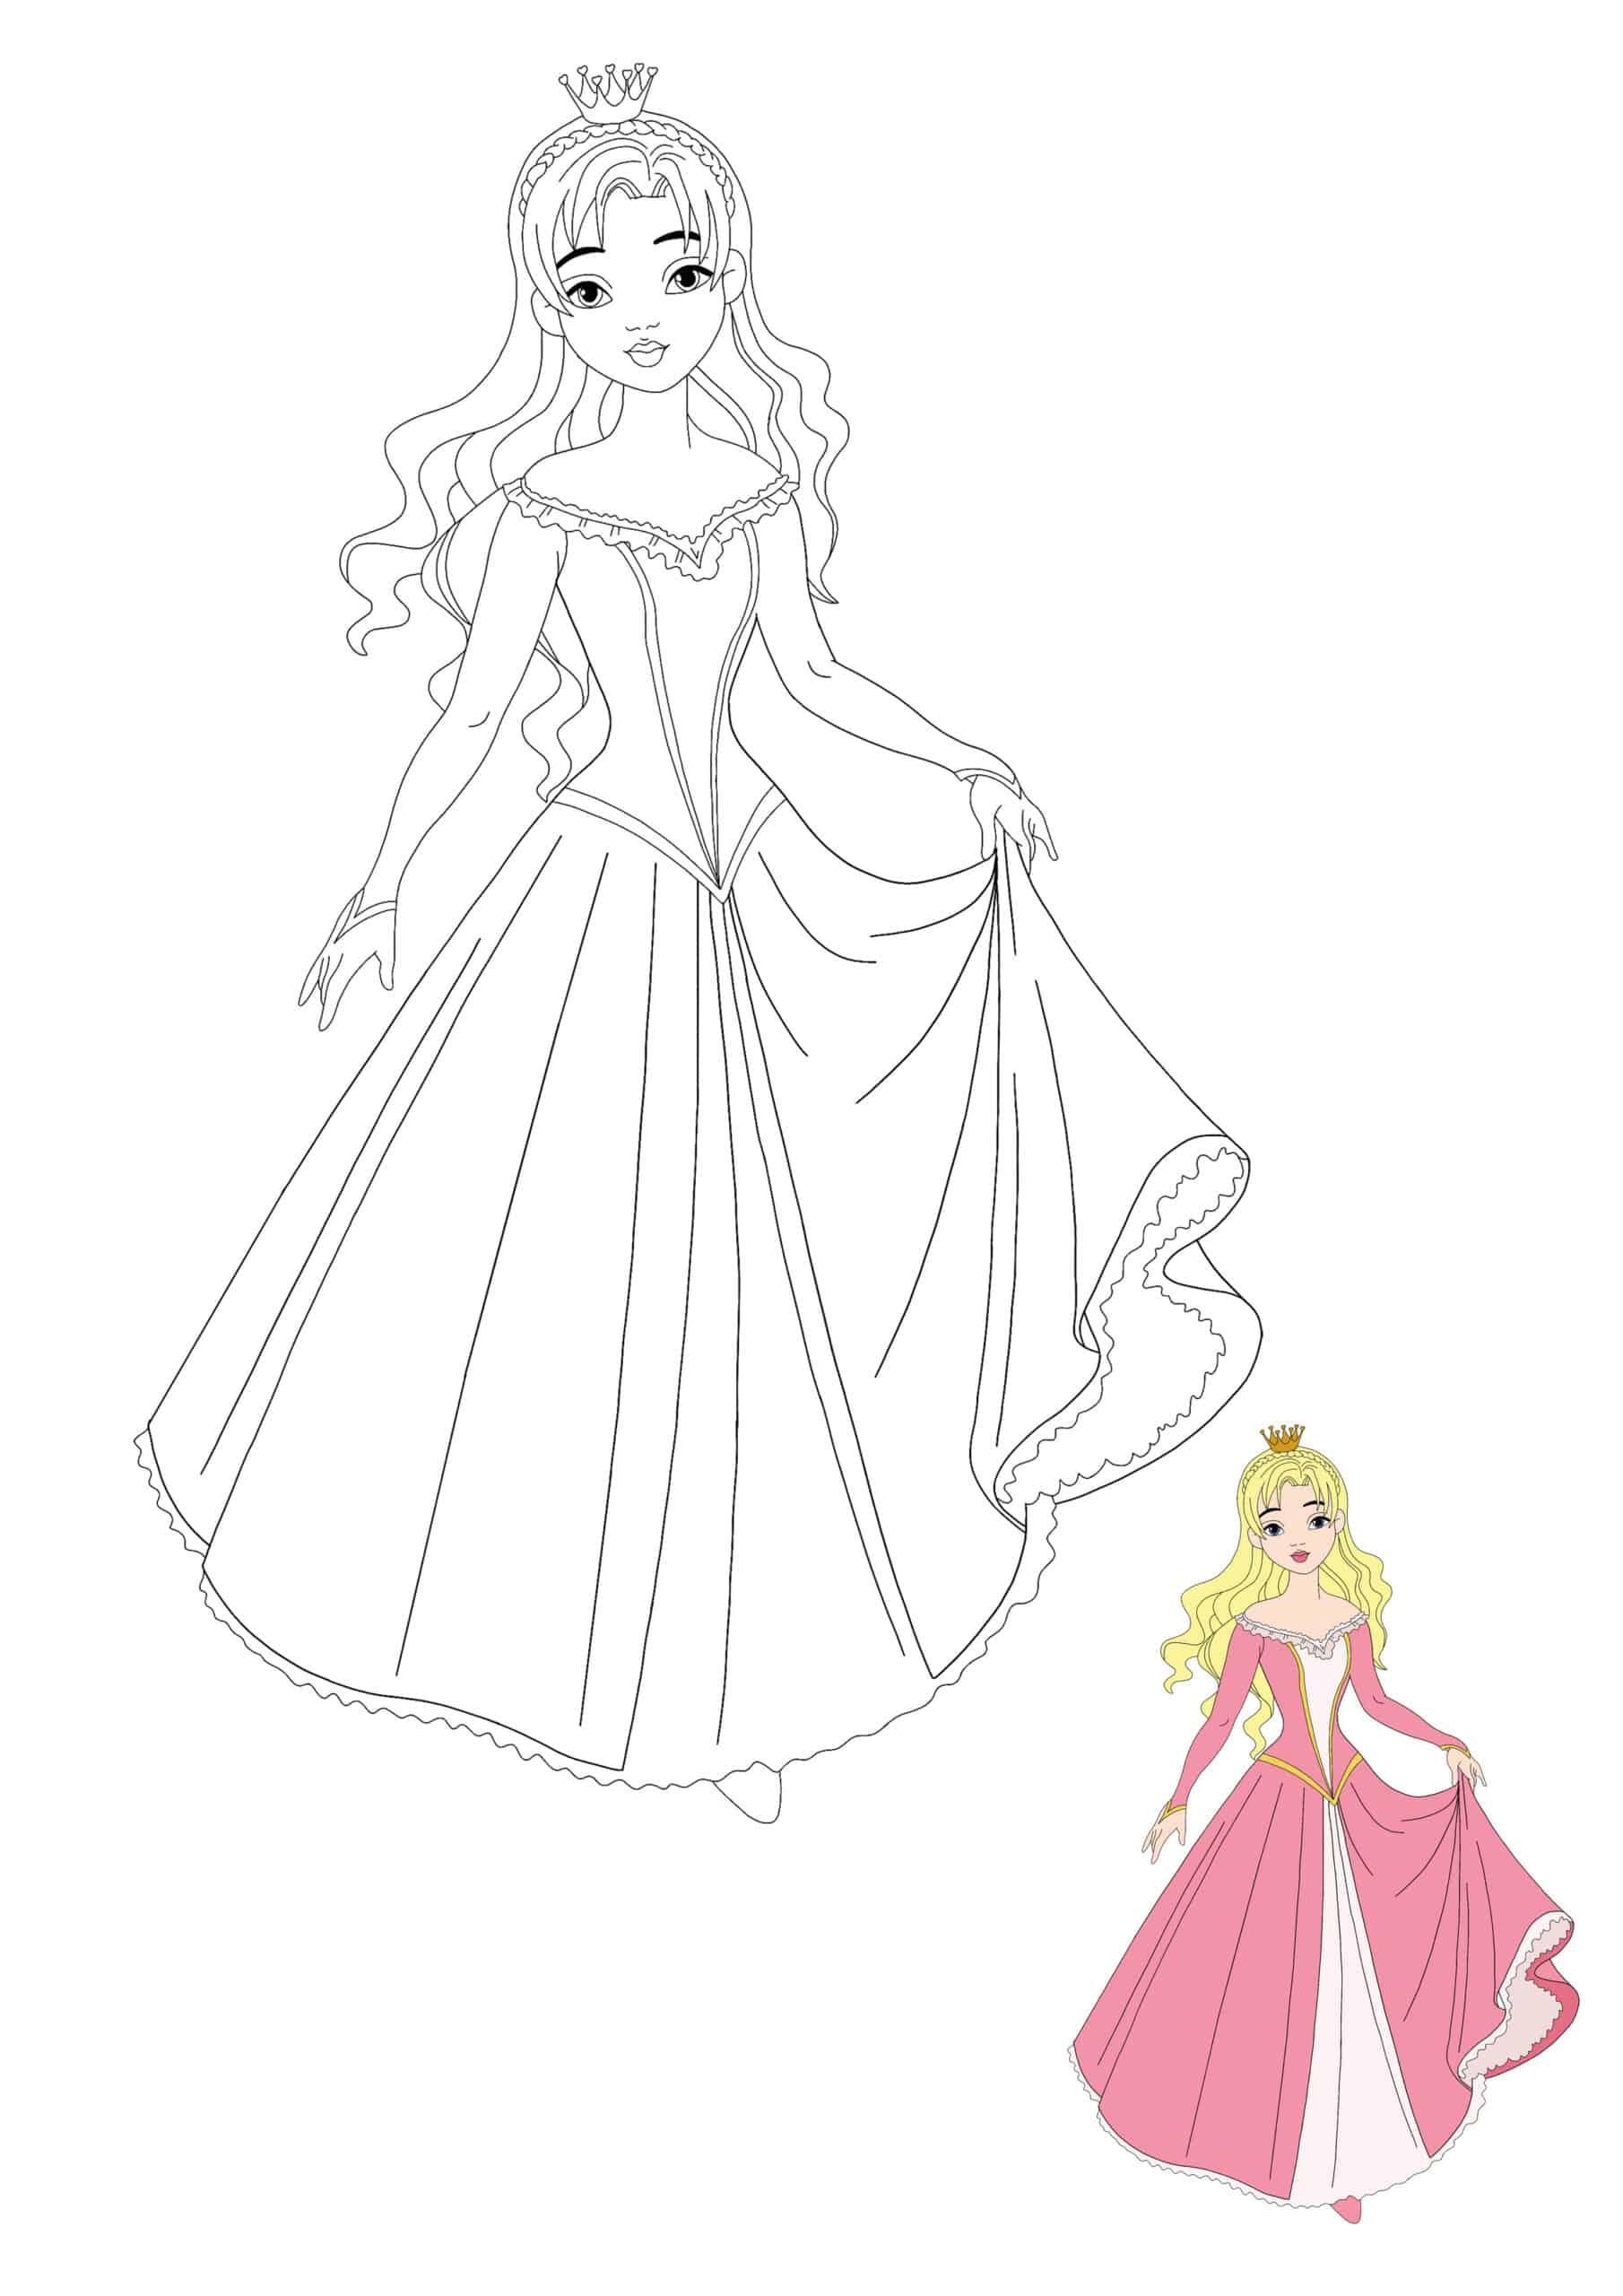 Beautiful Princess coloring sheet